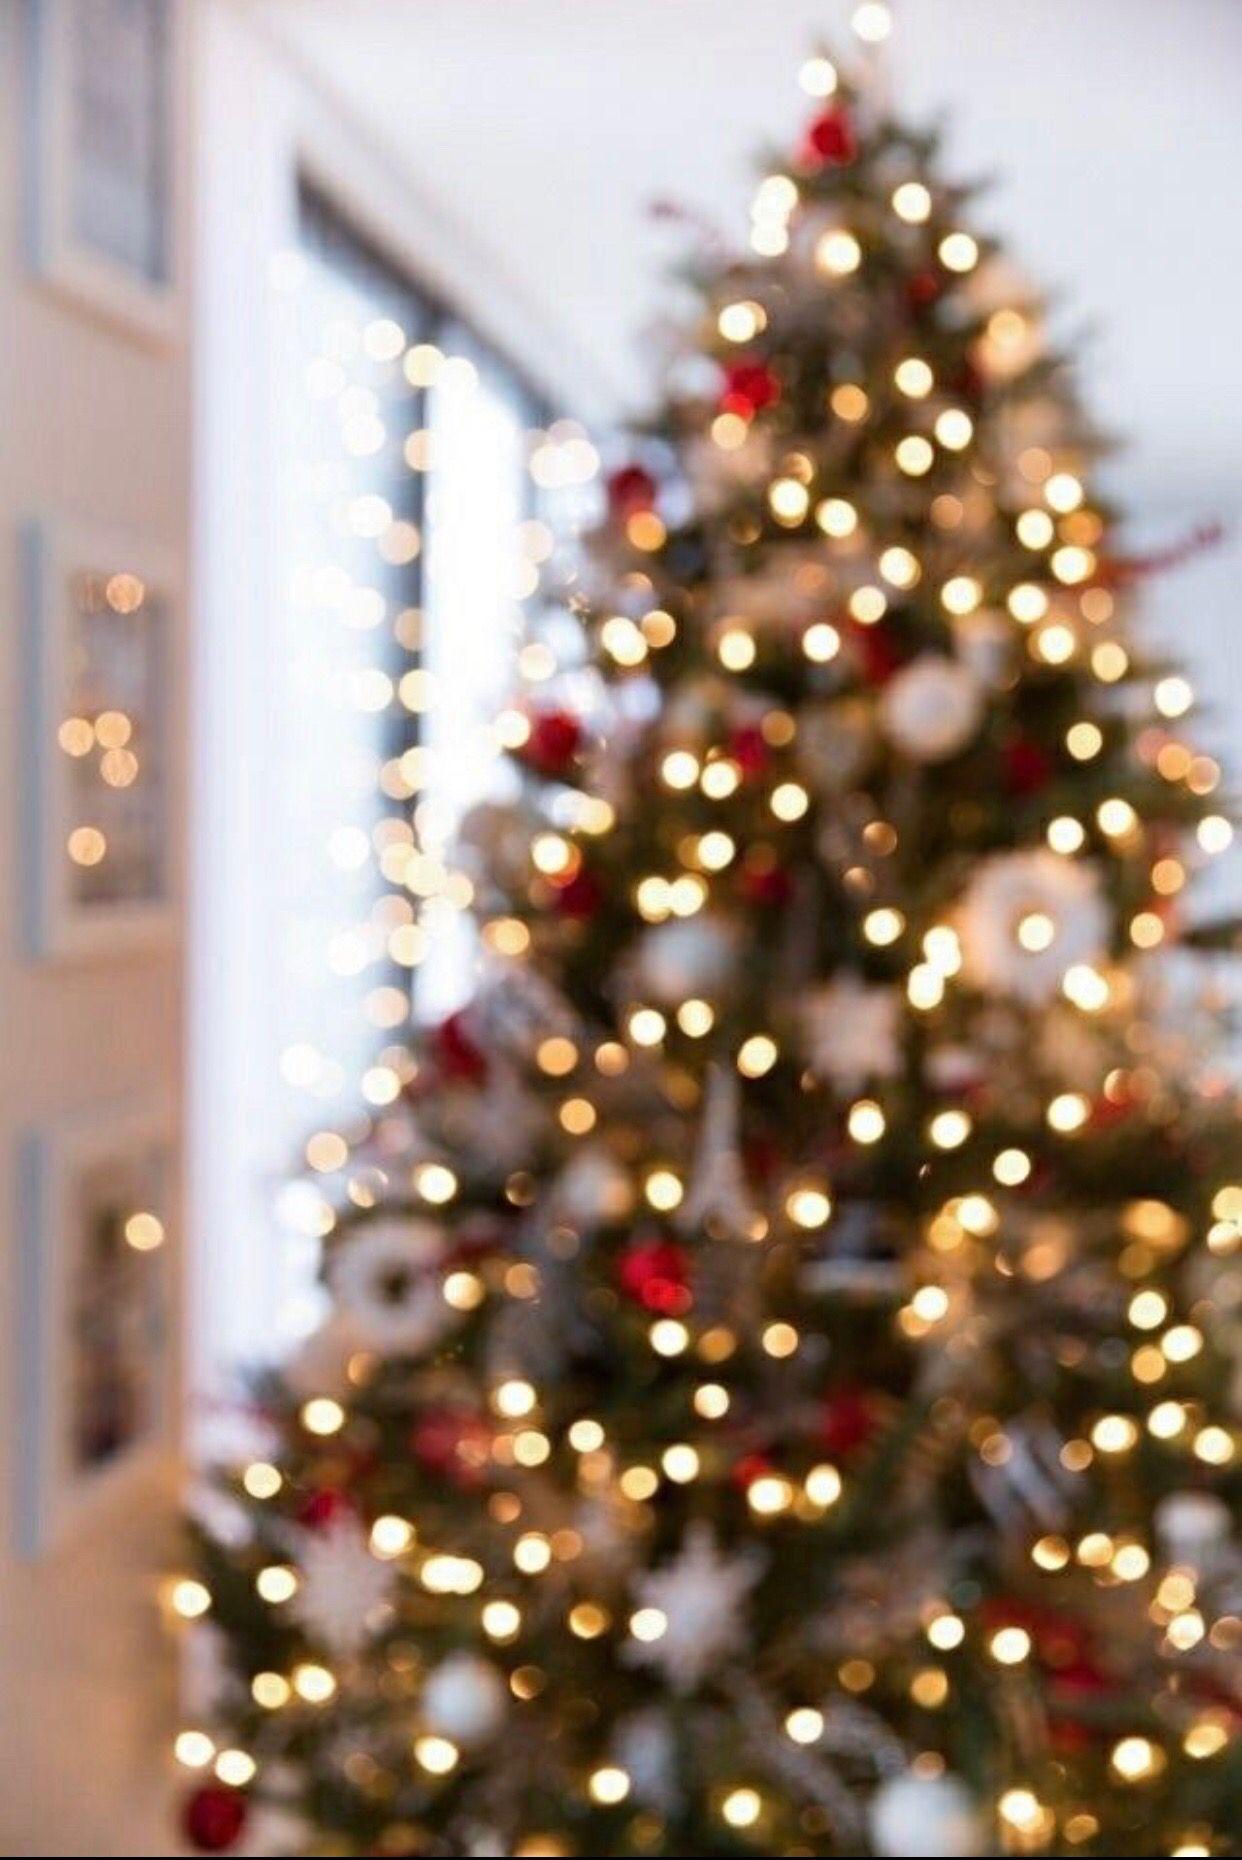 Xmas wallpaper, Christmas aesthetic, Christmas wallpaper